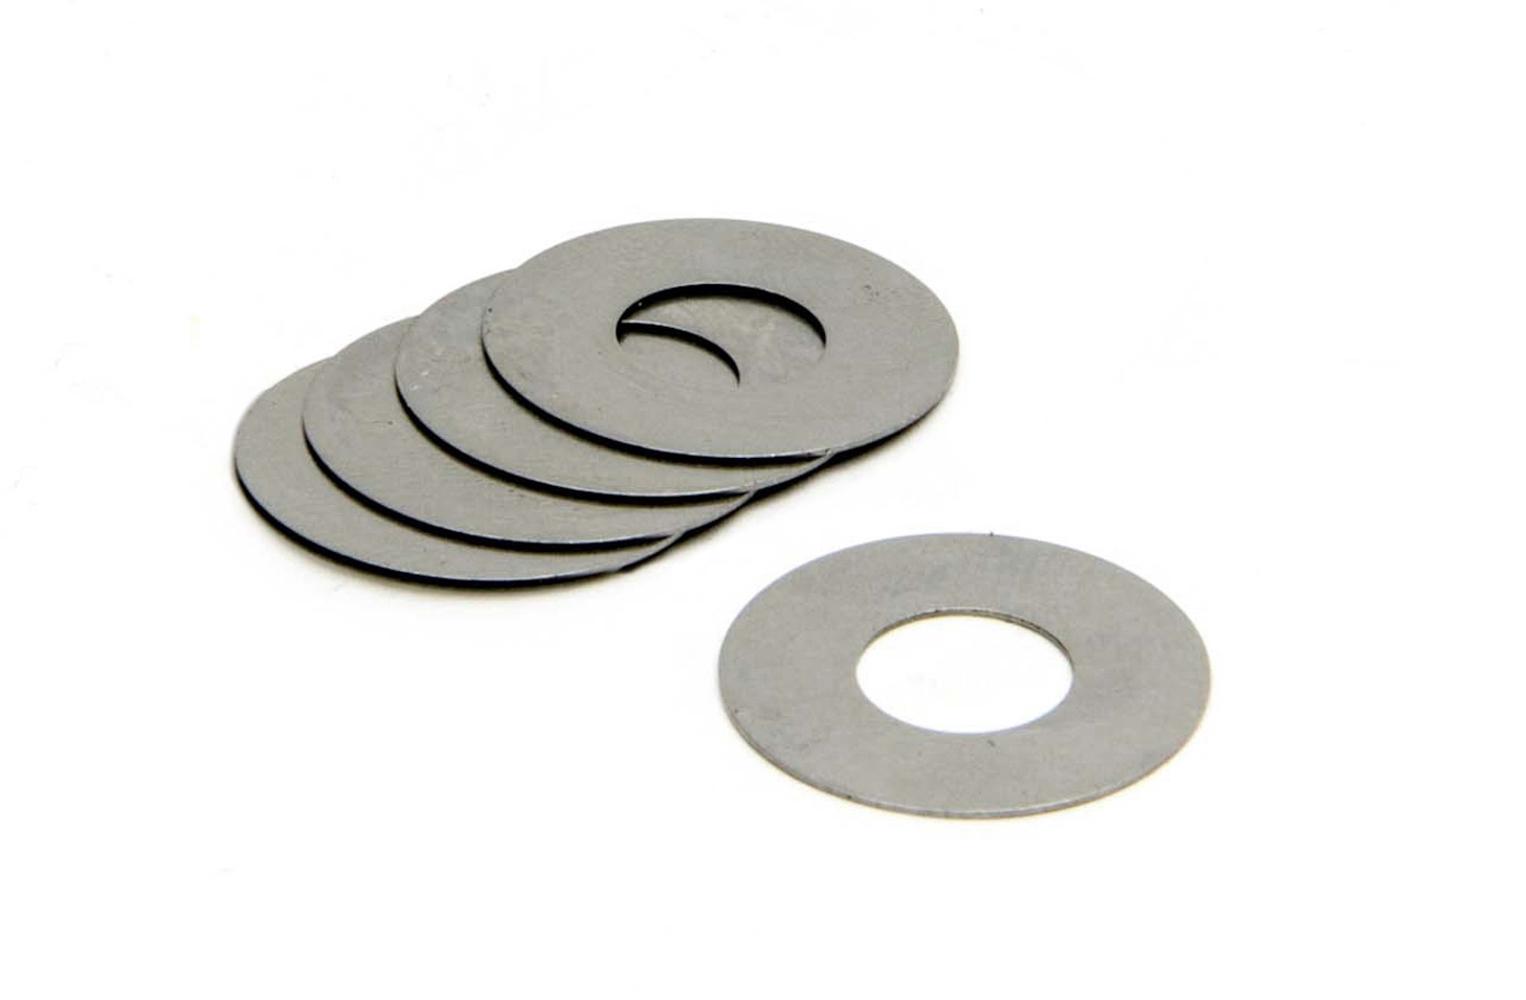 QA1 7855-183 Shock Valve, Disc, 1.300 x 0.006 in, Steel, QA1 Shocks, Set of 5